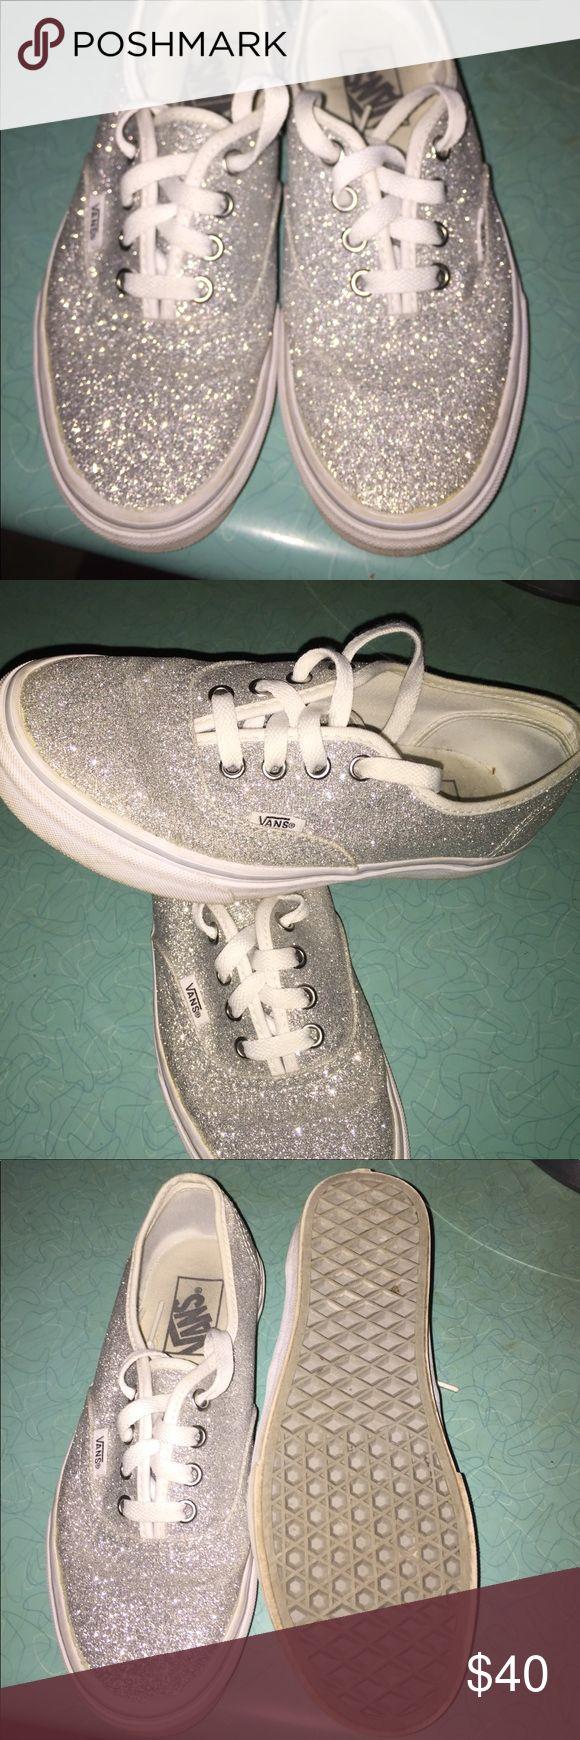 Super cute glitter vans! Excellent condition. Worn once. Size 6.5 Vans Shoes Sneakers